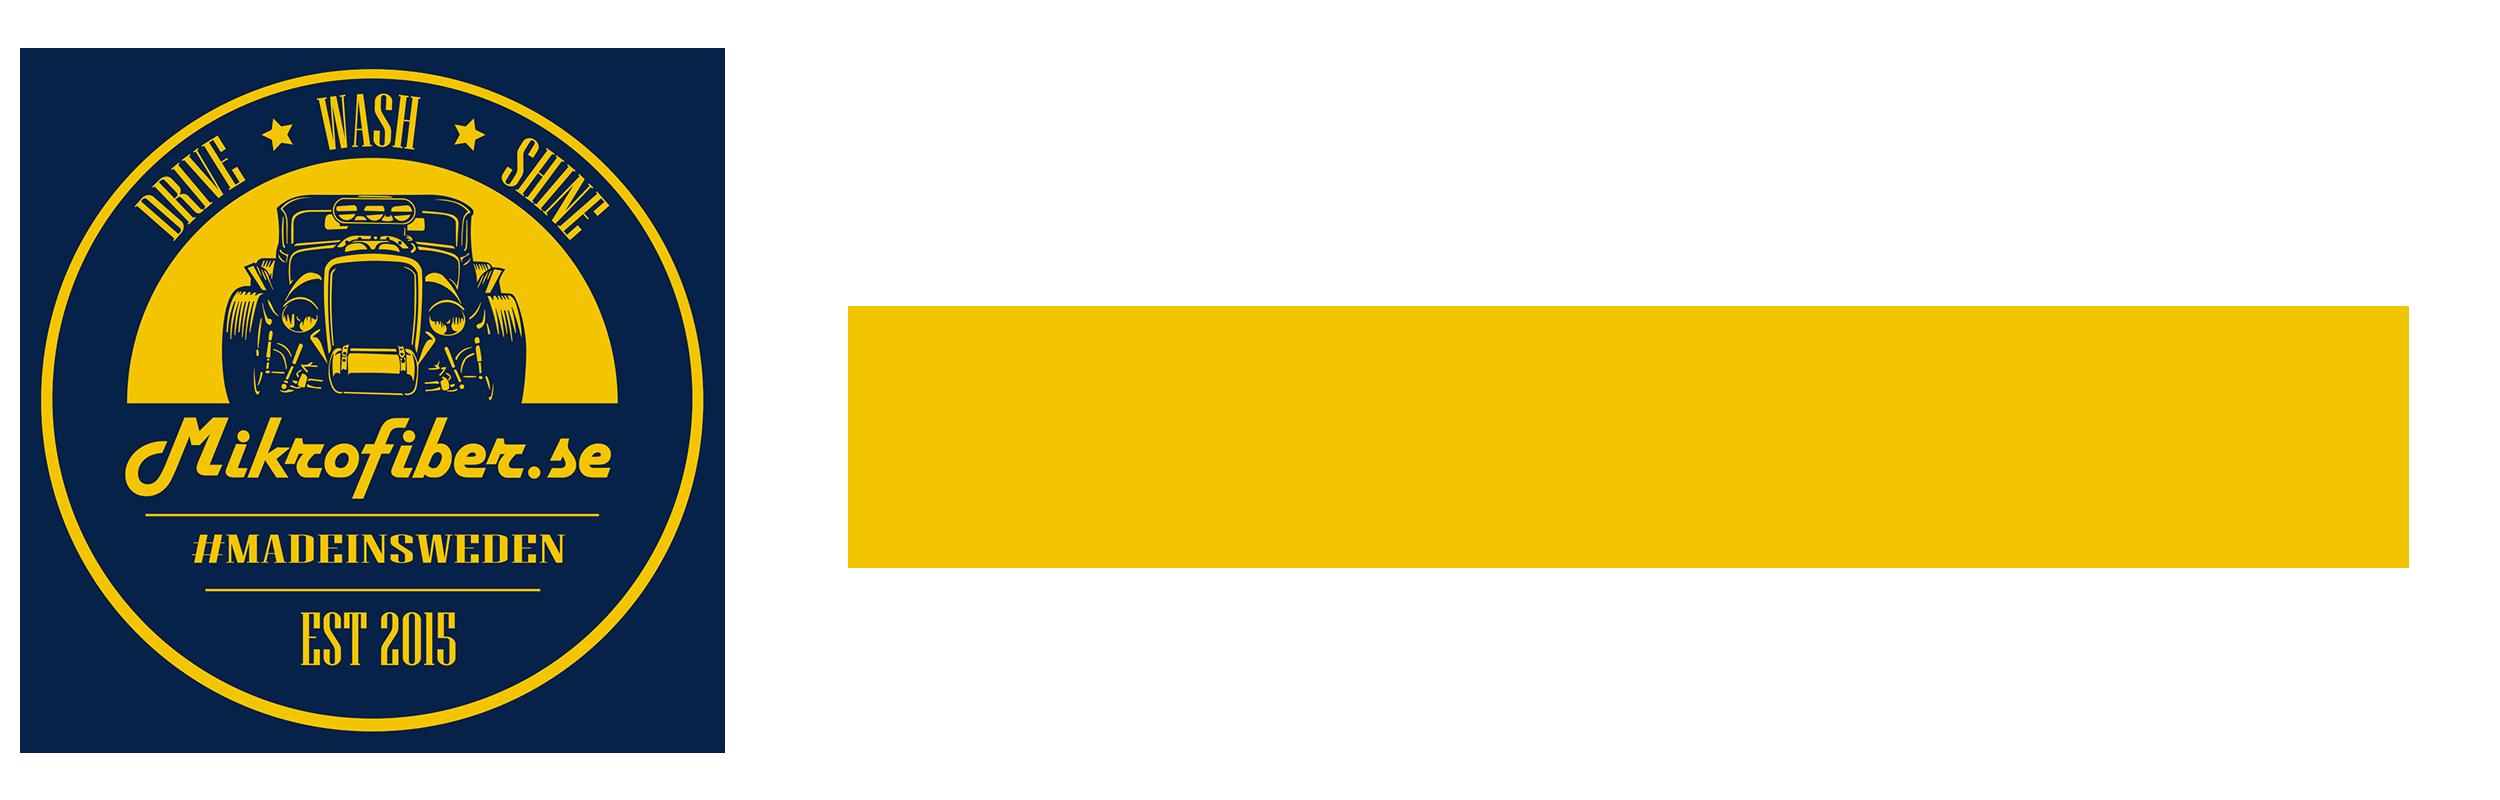 Mikrofiber.se